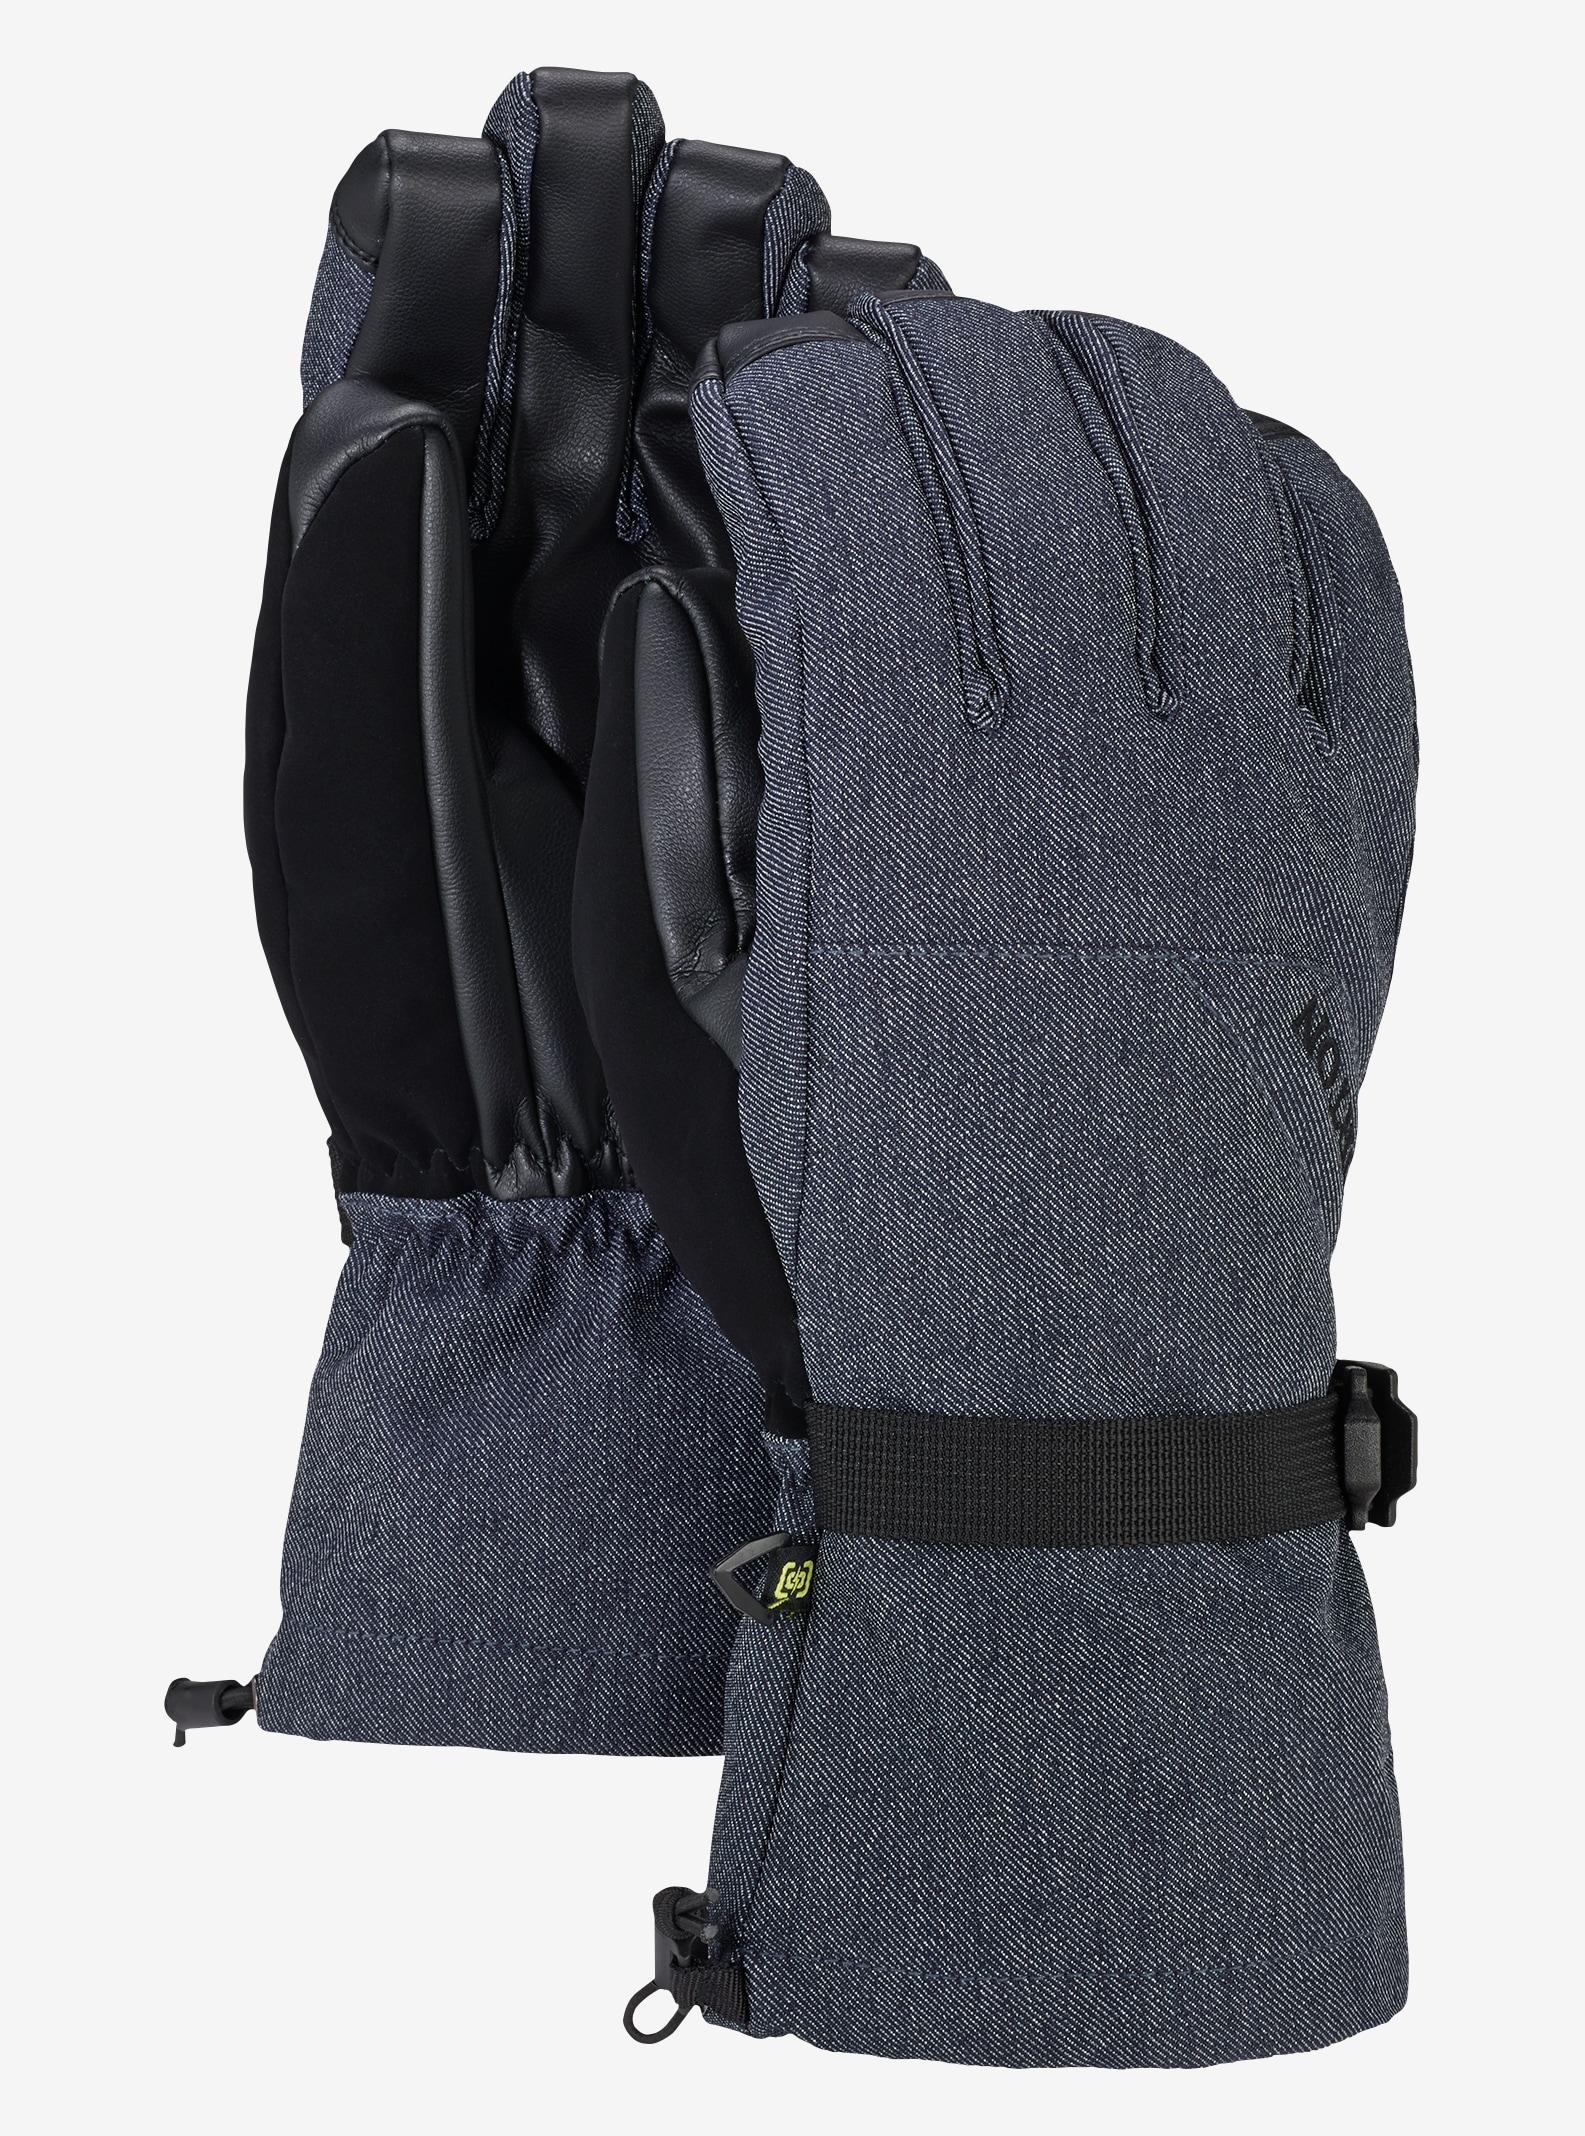 Men's Burton Prospect Glove shown in Denim